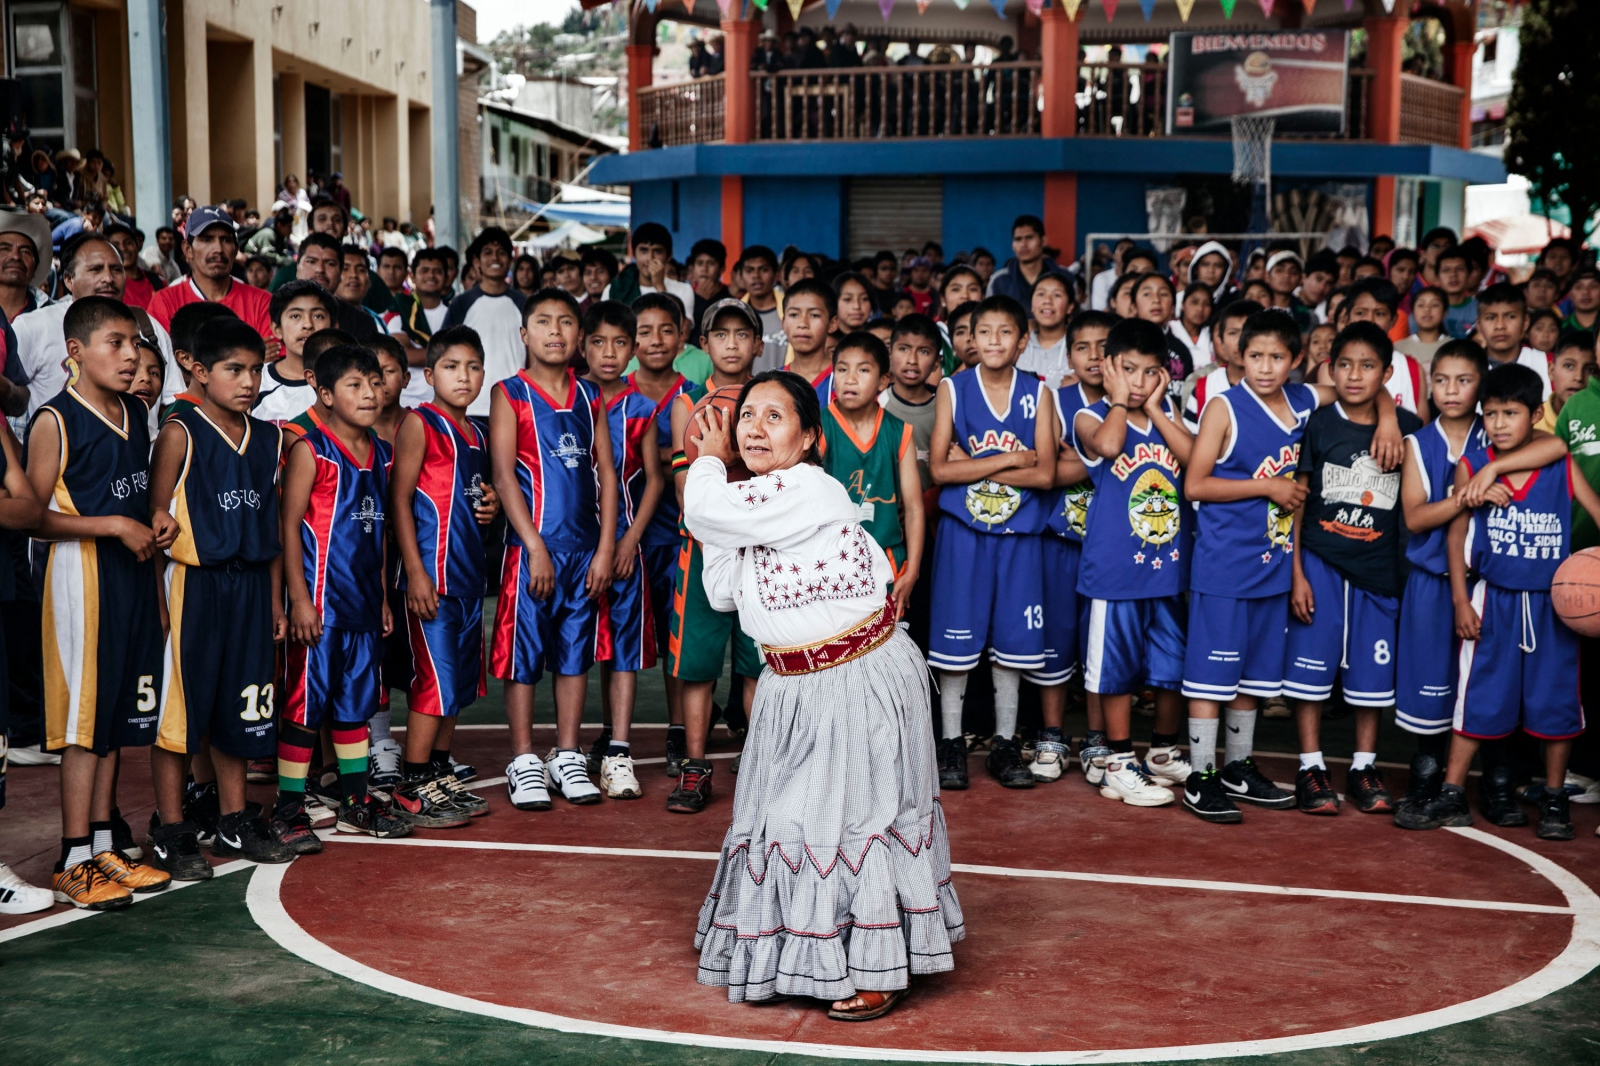 SANTA MARIA TLAHUITOLTEPEC, MAY 19, 2012. Tlahuitotepec's first female mayor Sofia Robles, takes the opening shot at the basketball tournament.